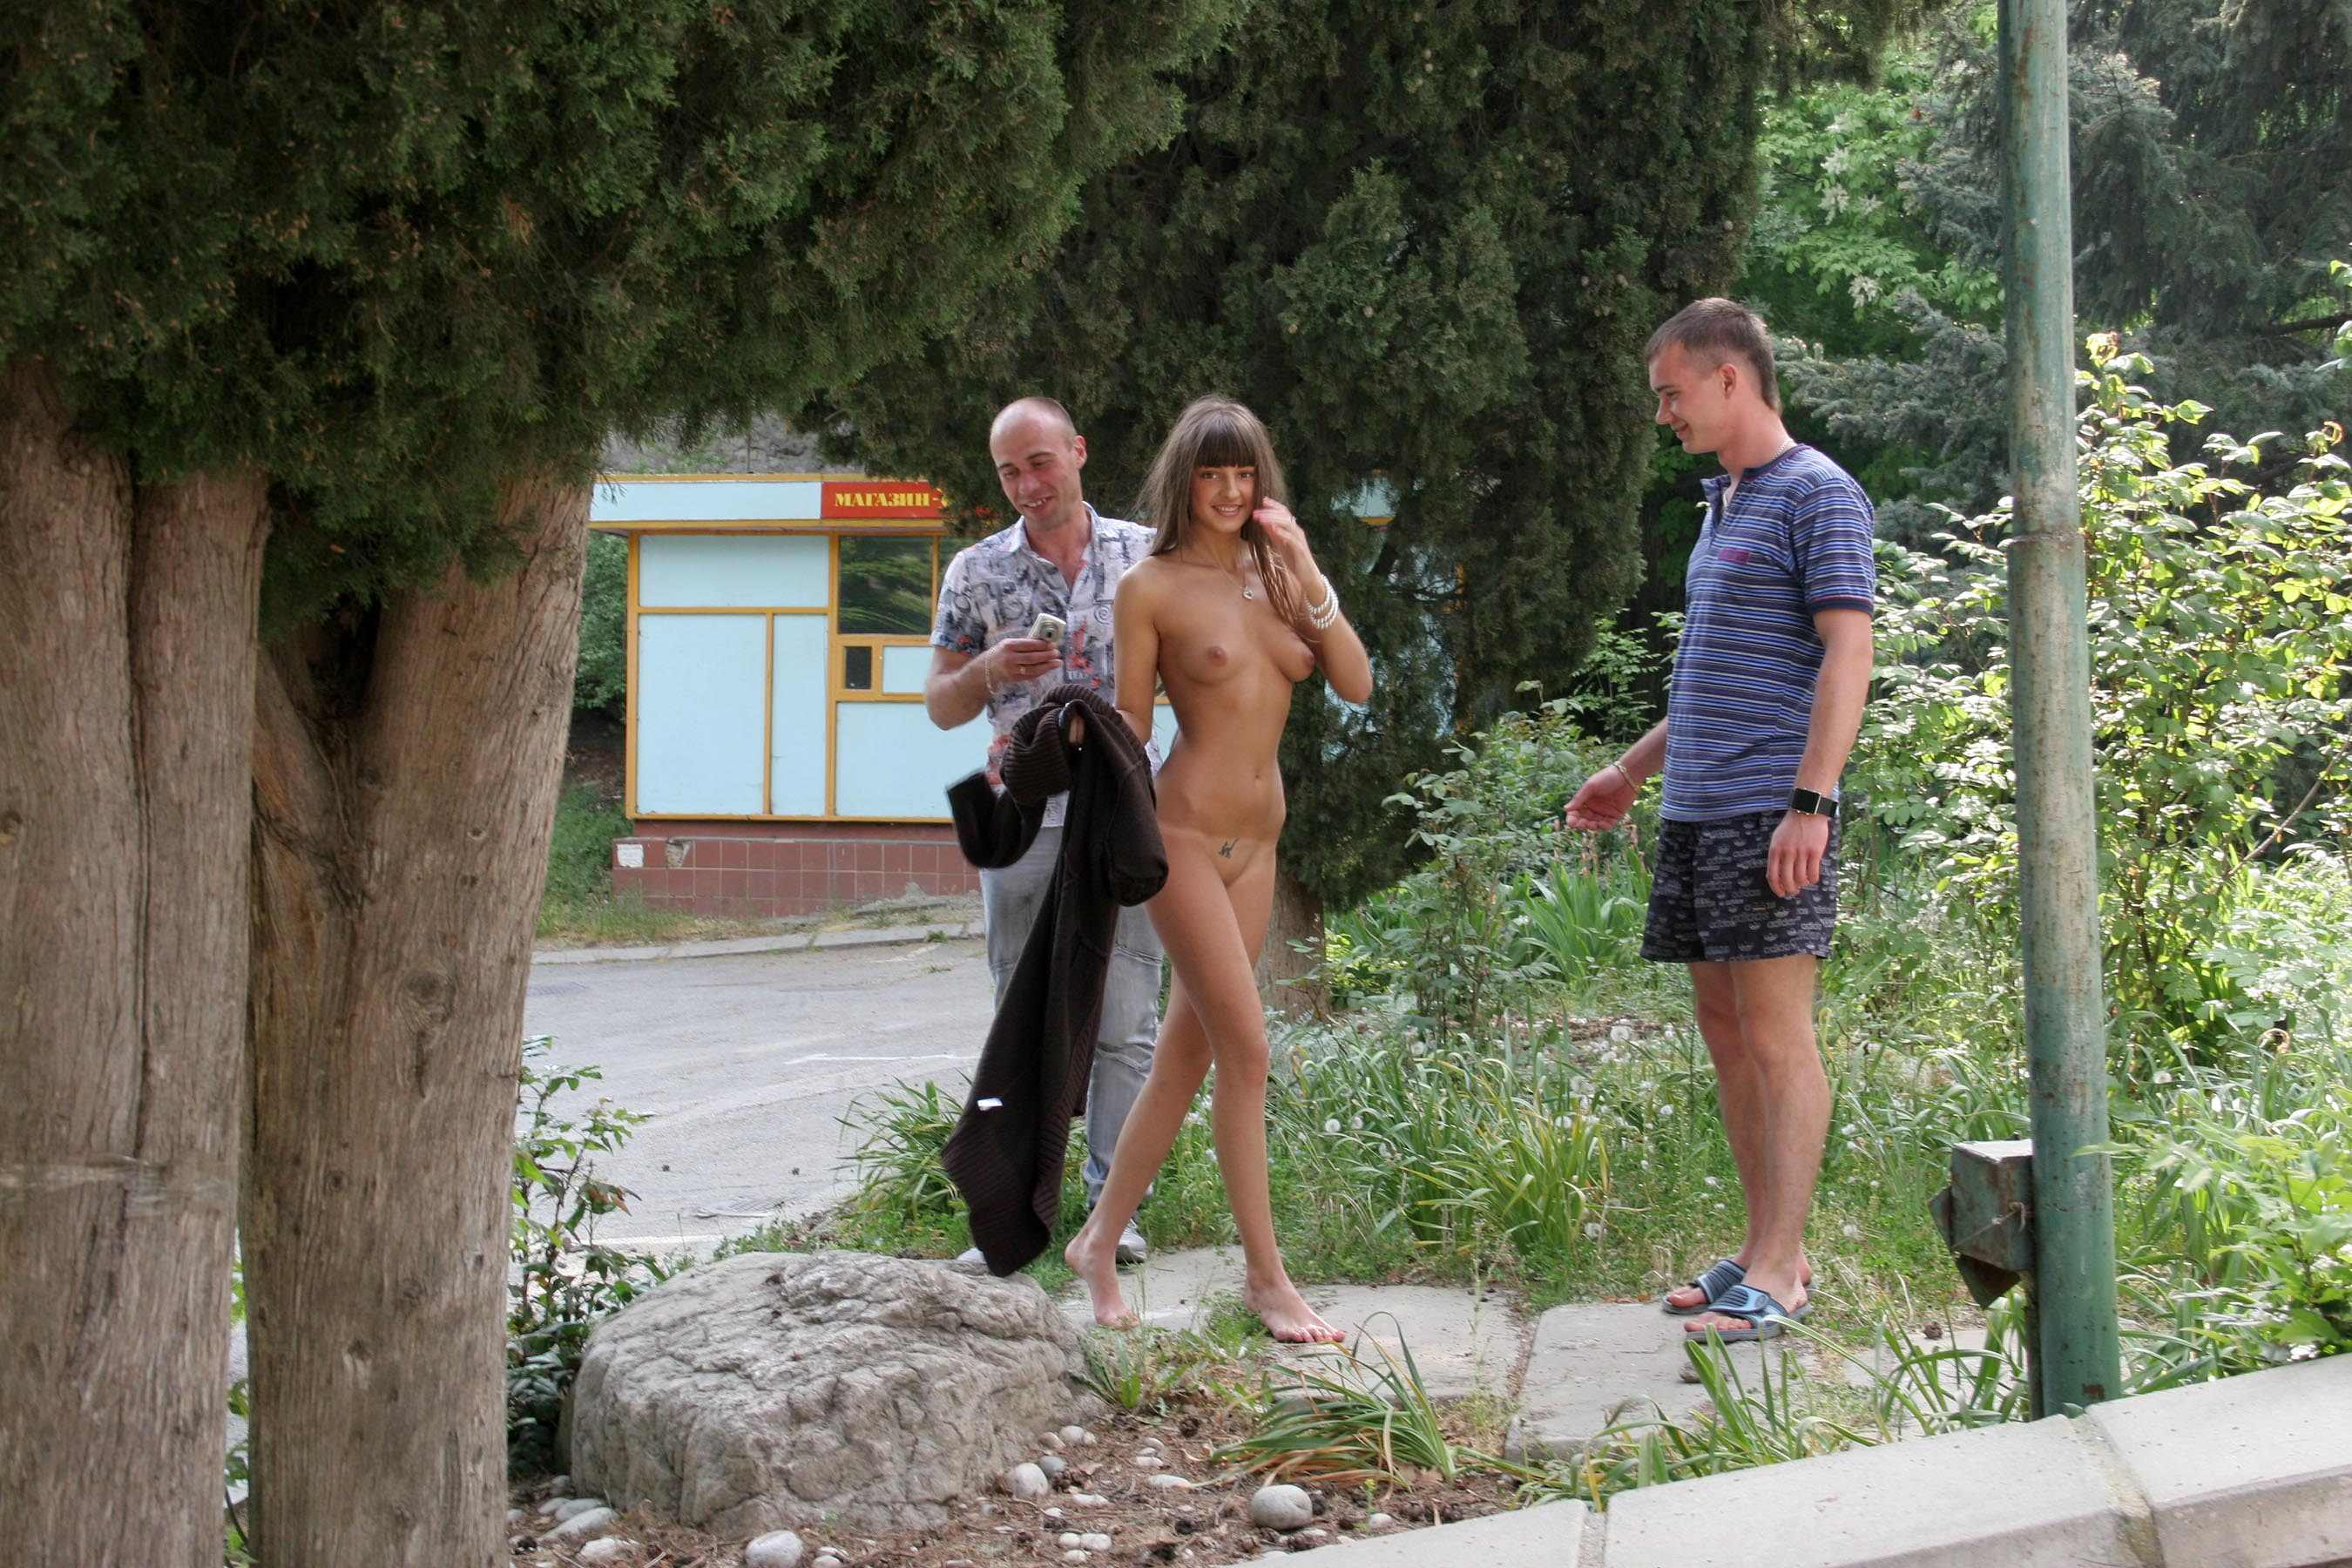 melena-crimean-holiday-public-nude-in-russia-01